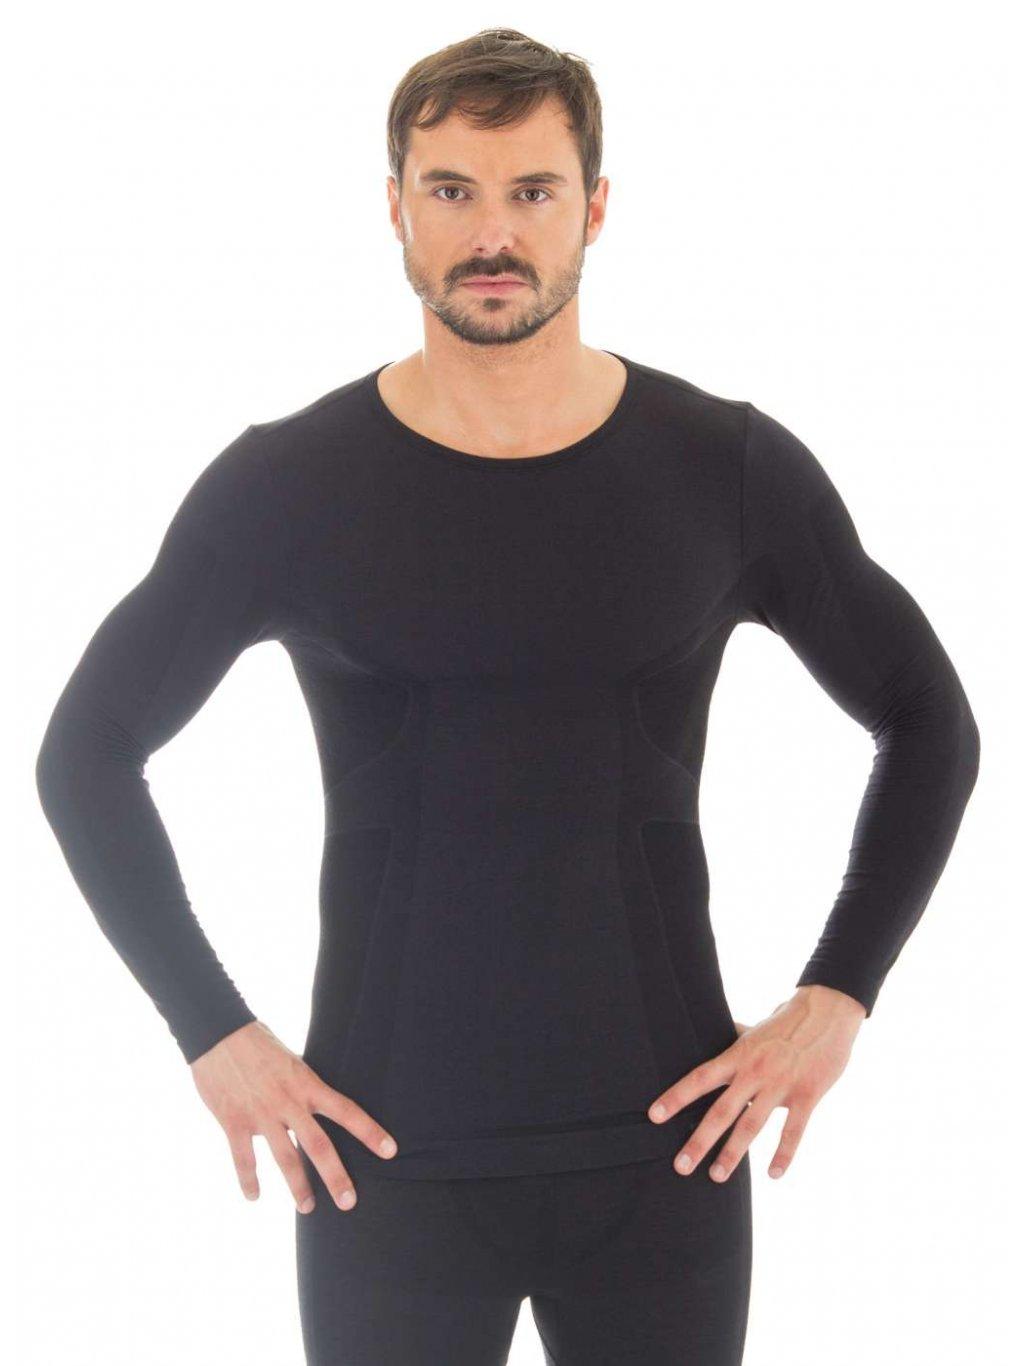 LS11600 black